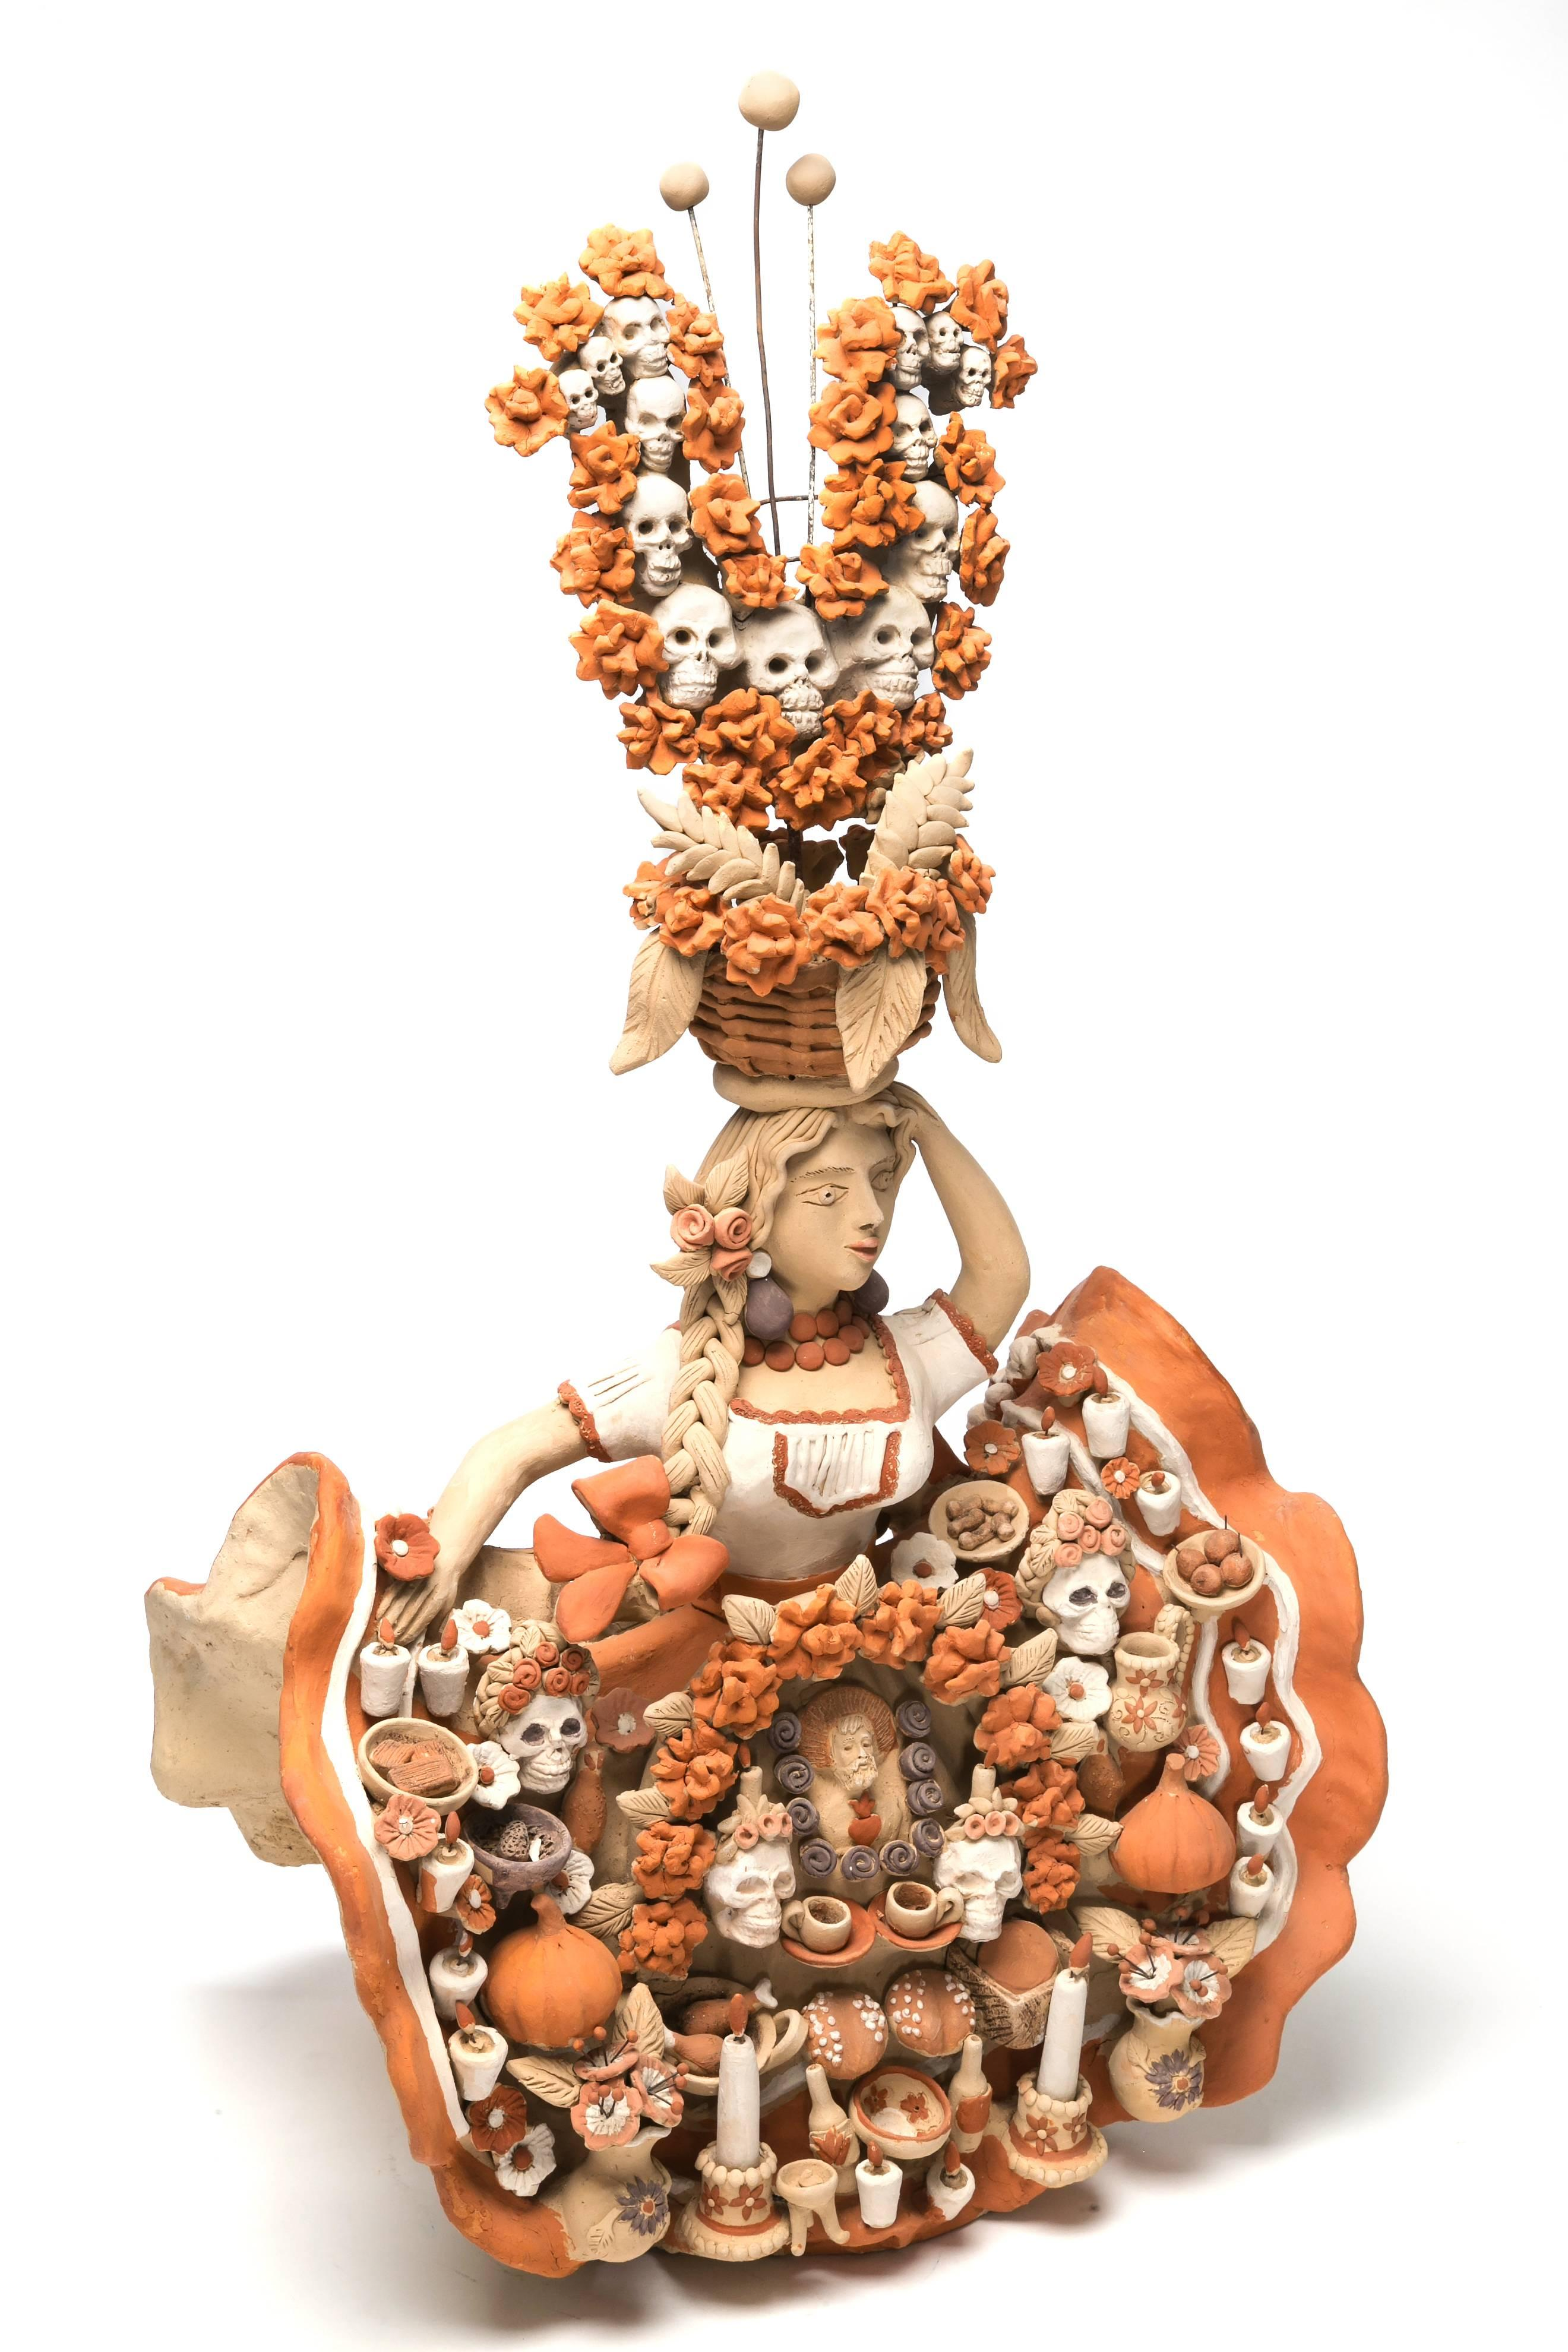 China Oaxaqueña con Altar de Muertos / Ceramics Mexican Folk Art Clay